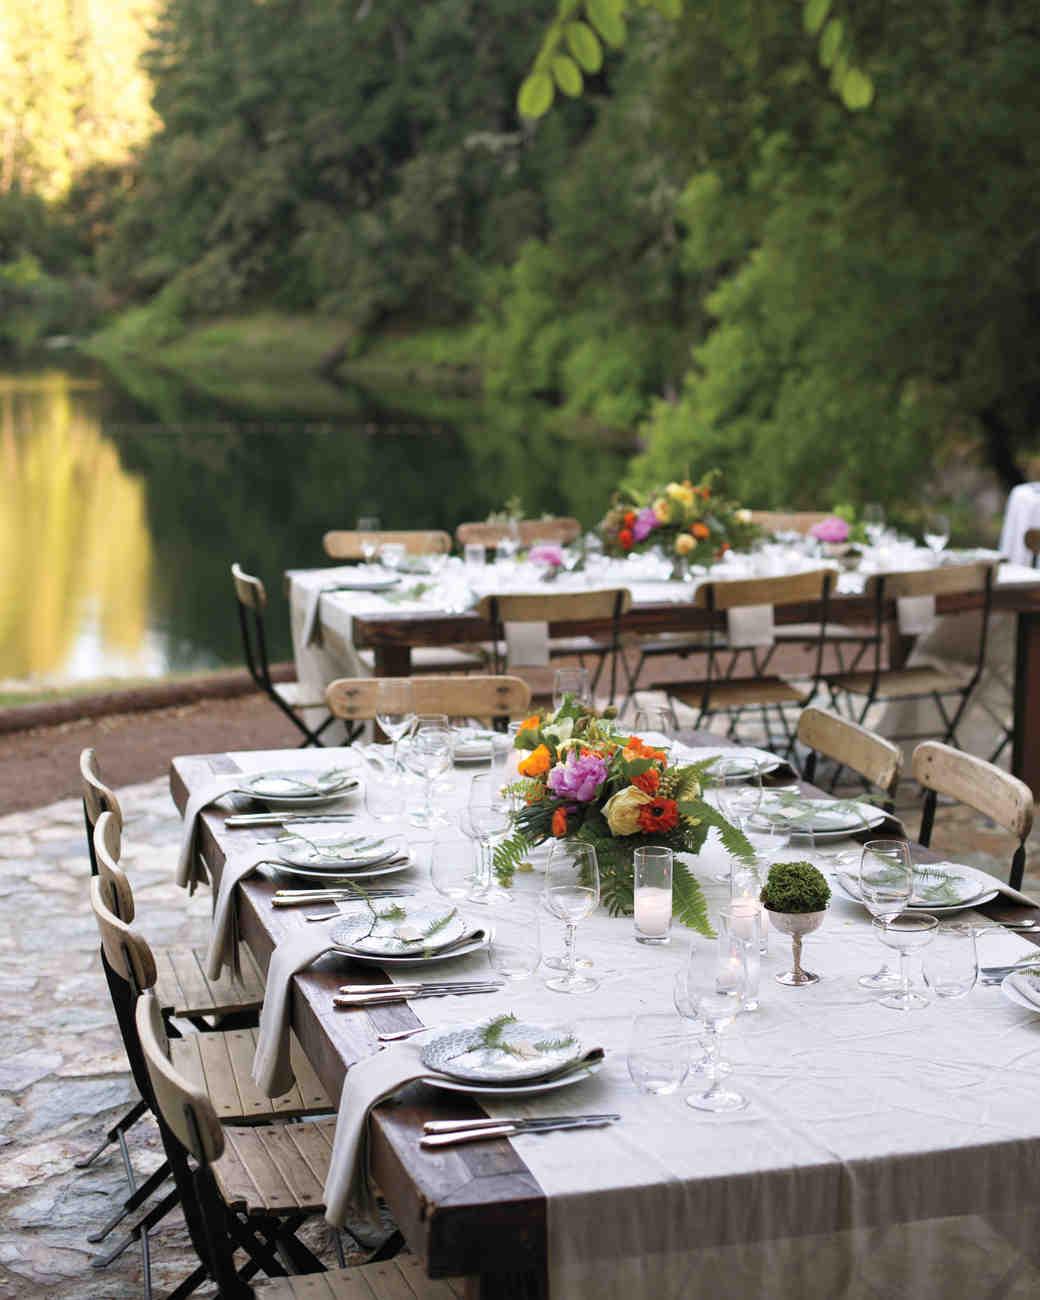 Nicki And Mikeu0027s Rustic Wedding In The Northern California Woods | Martha  Stewart Weddings